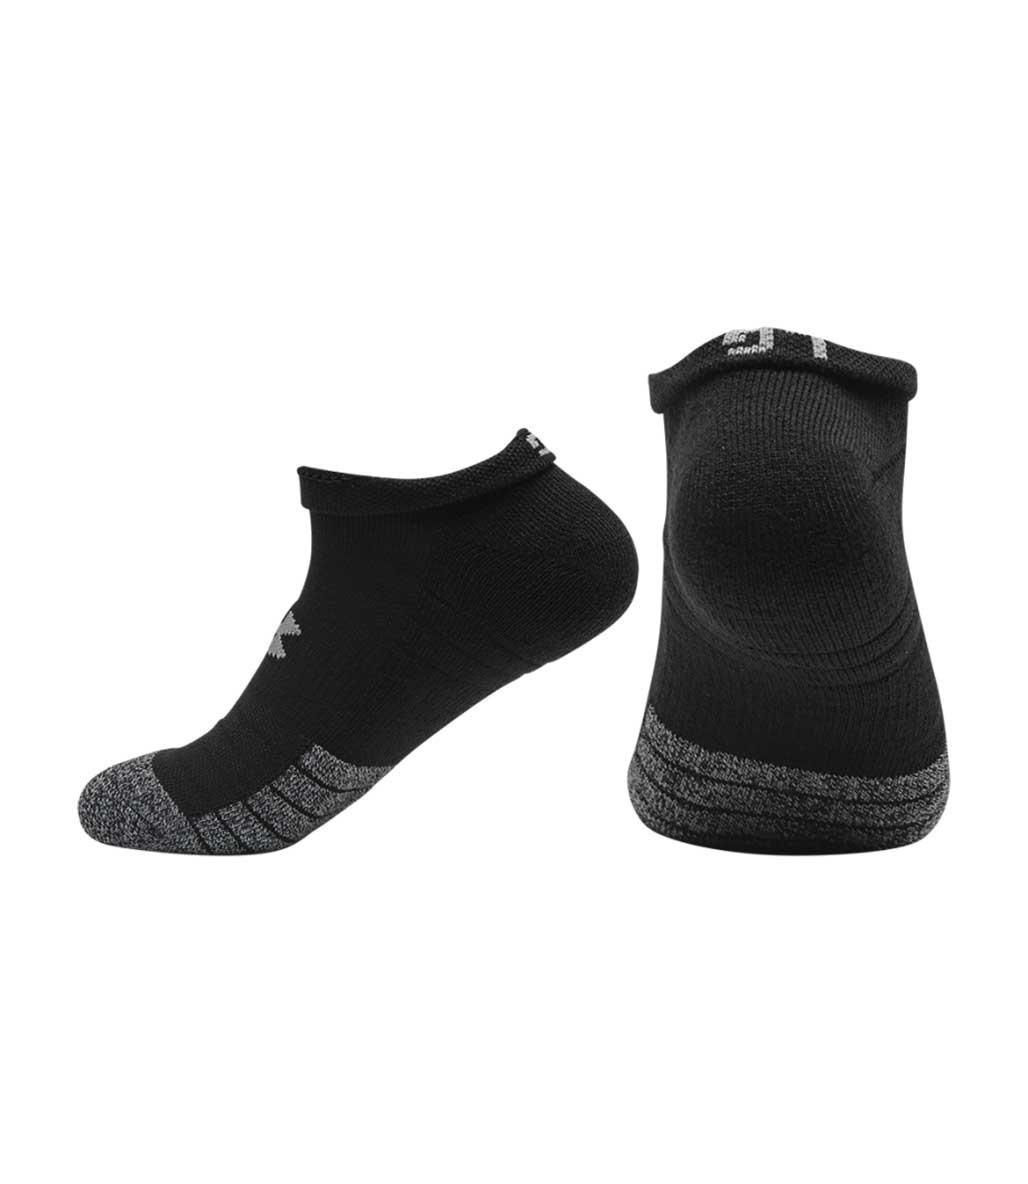 Under Armour Heatgear No Show Çorap 3'lü Paket Siyah